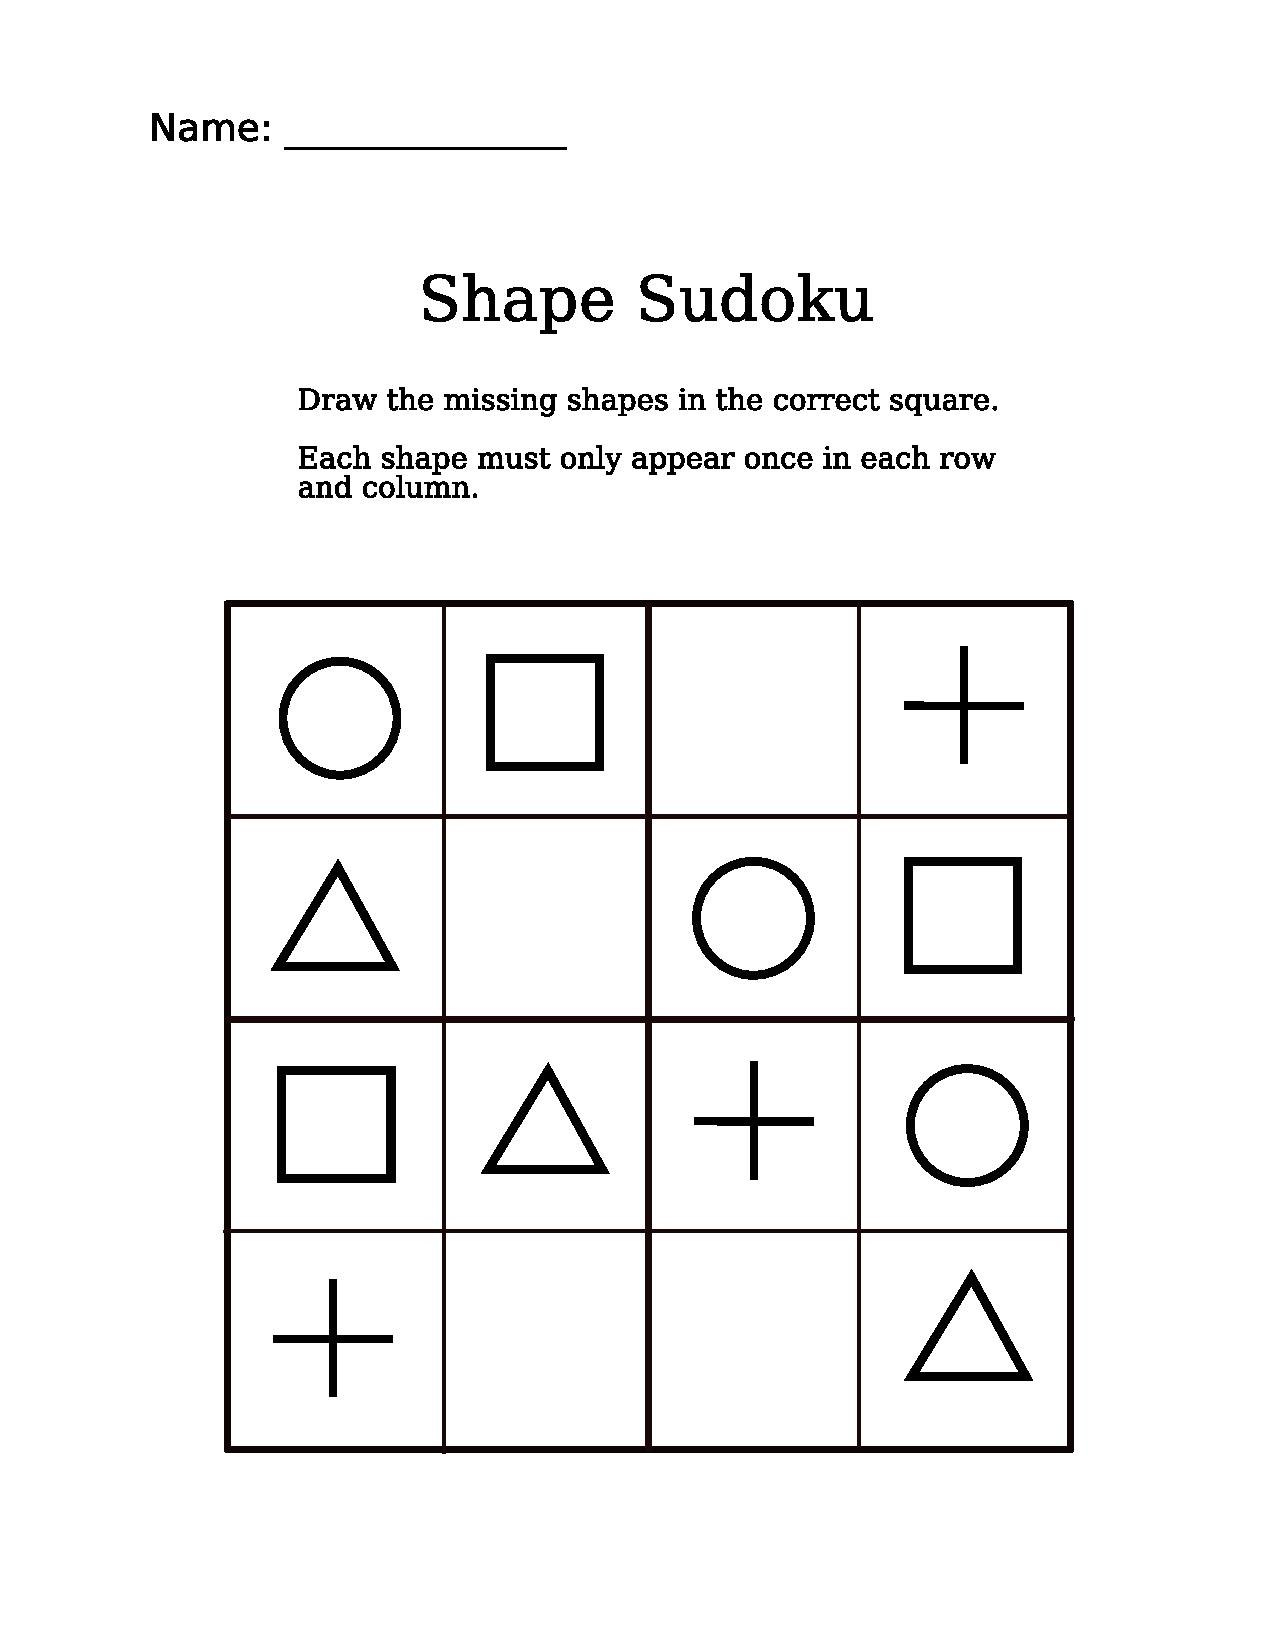 File:4X4 Shapes Sudoku Puzzle.pdf - Wikimedia Commons - Printable Sudoku Puzzles 4X4